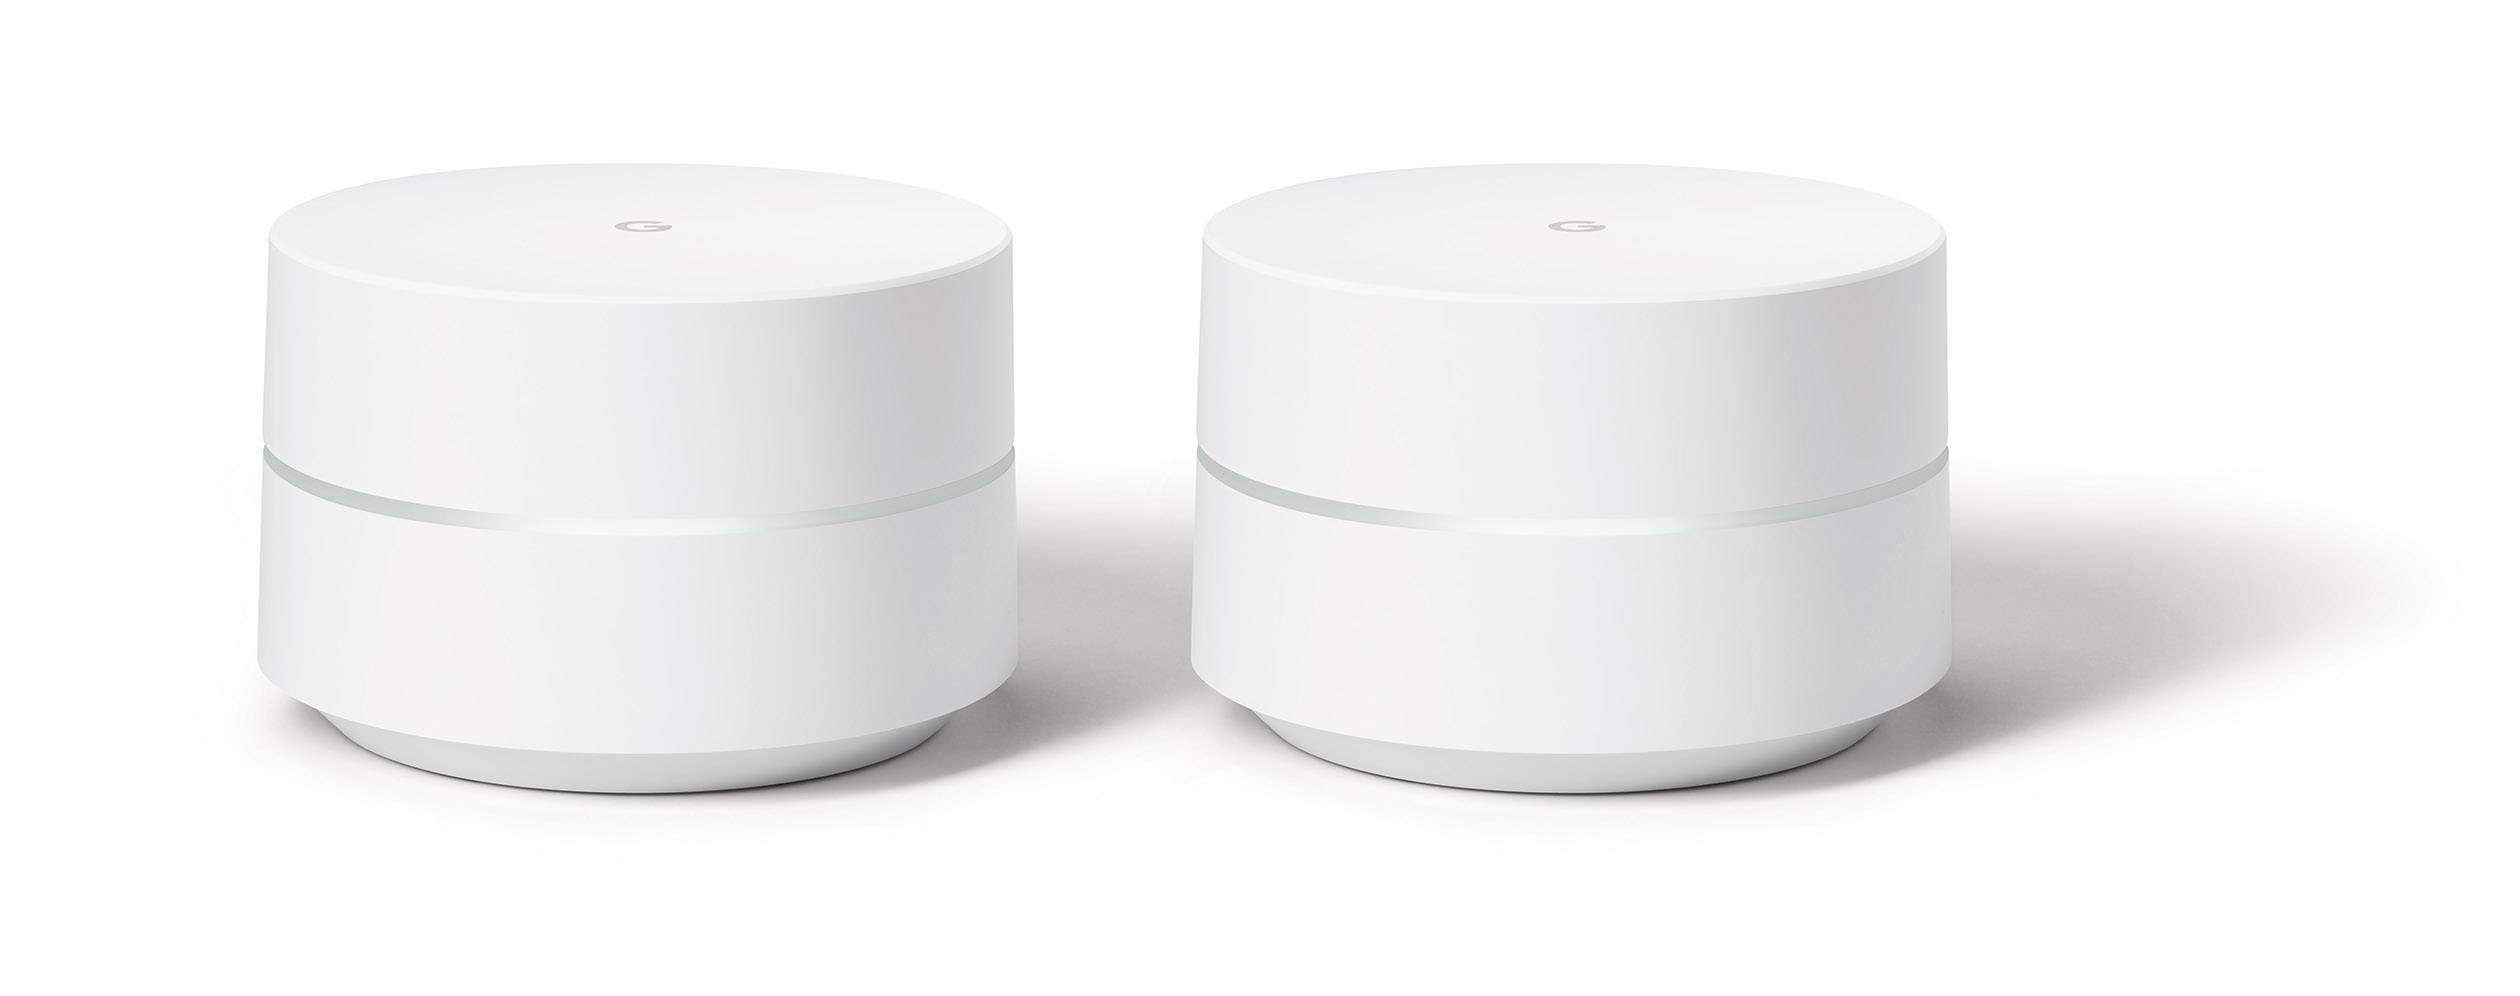 Wi-Fi router Google Wifi GA00190-DE, 2.4 GHz, 5 GHz, výhodna sada 2 adaptérov